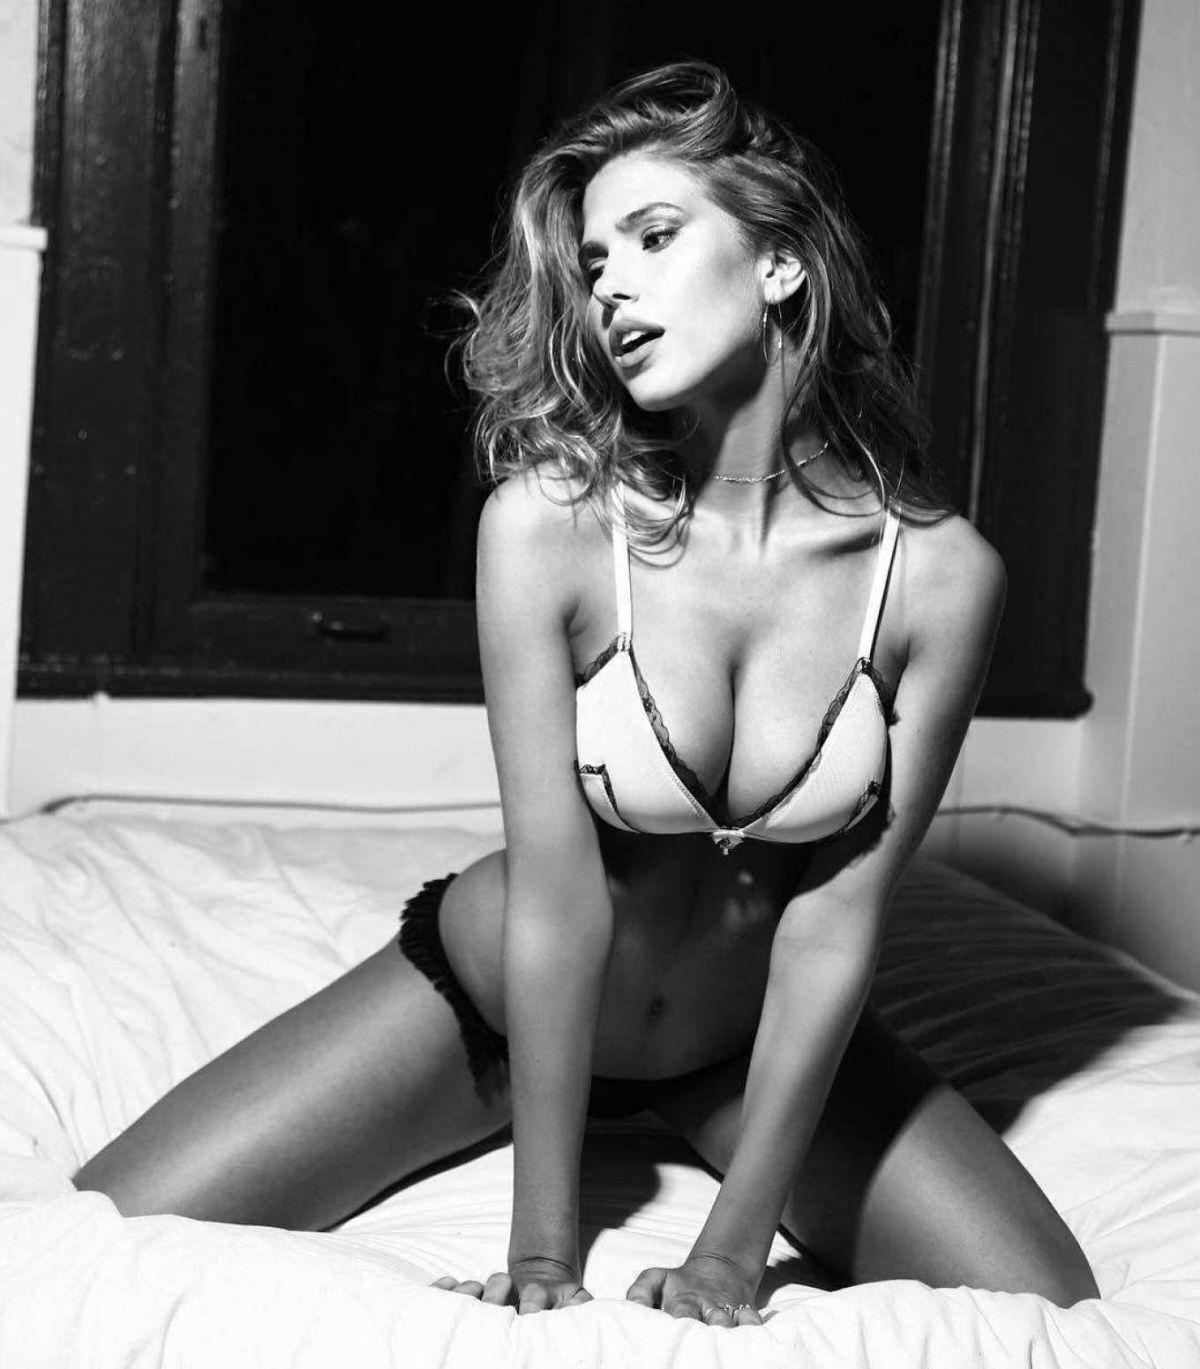 Kara Del Toro Stunning Boobs